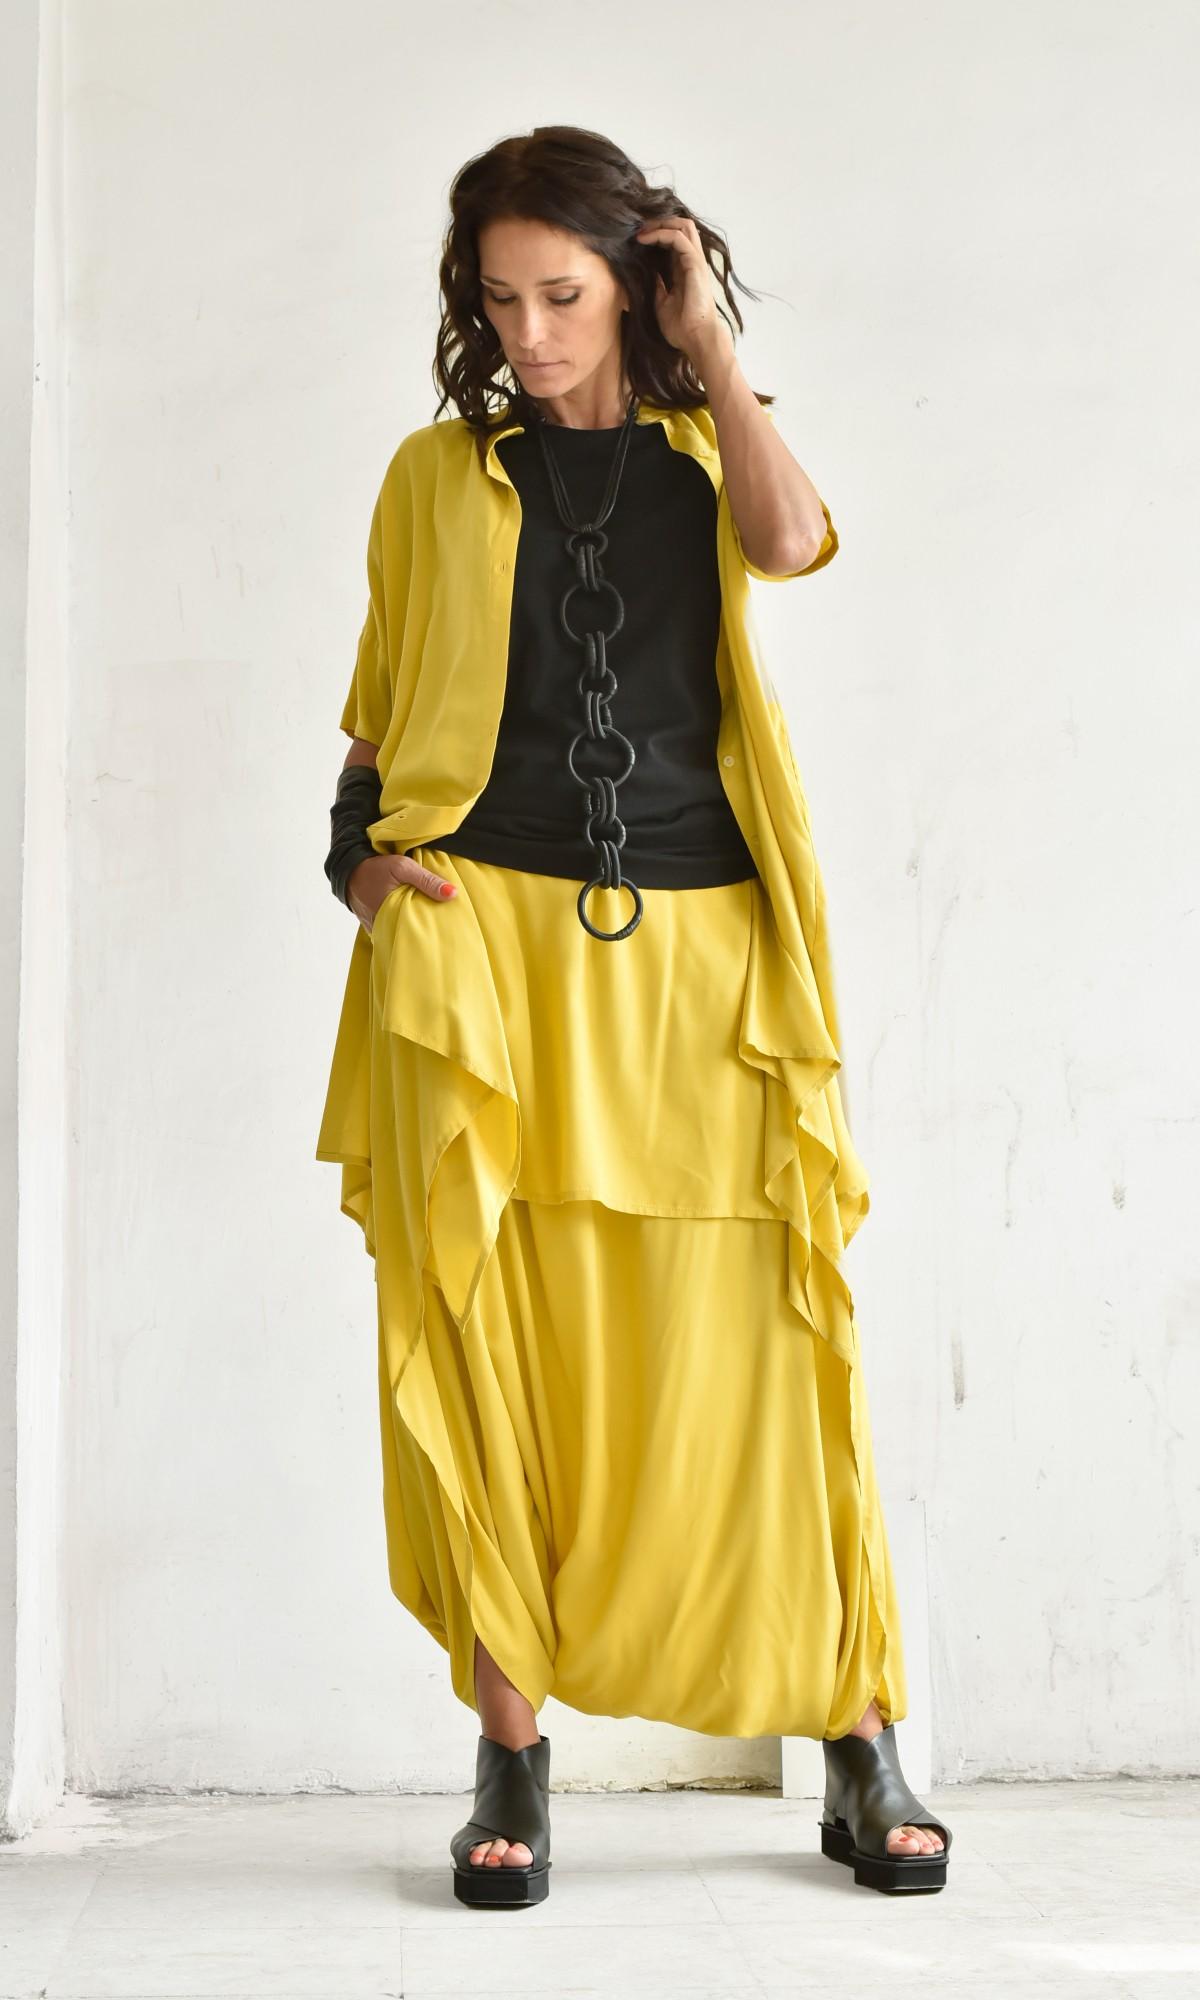 Elegant Drop Crotch Skirt Pants A90241